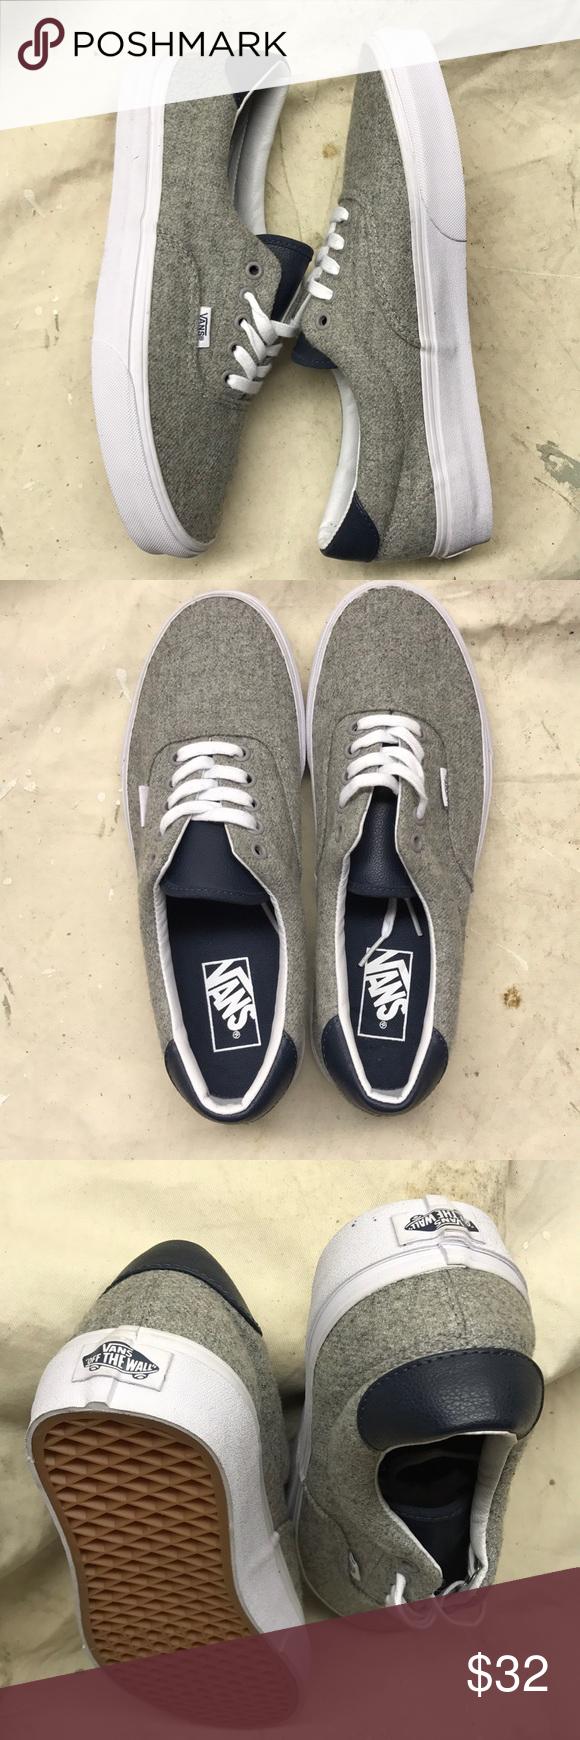 Vans Era VANS SHOES Style- Era 59 Color- varsity   grey wool 9927737b0c12